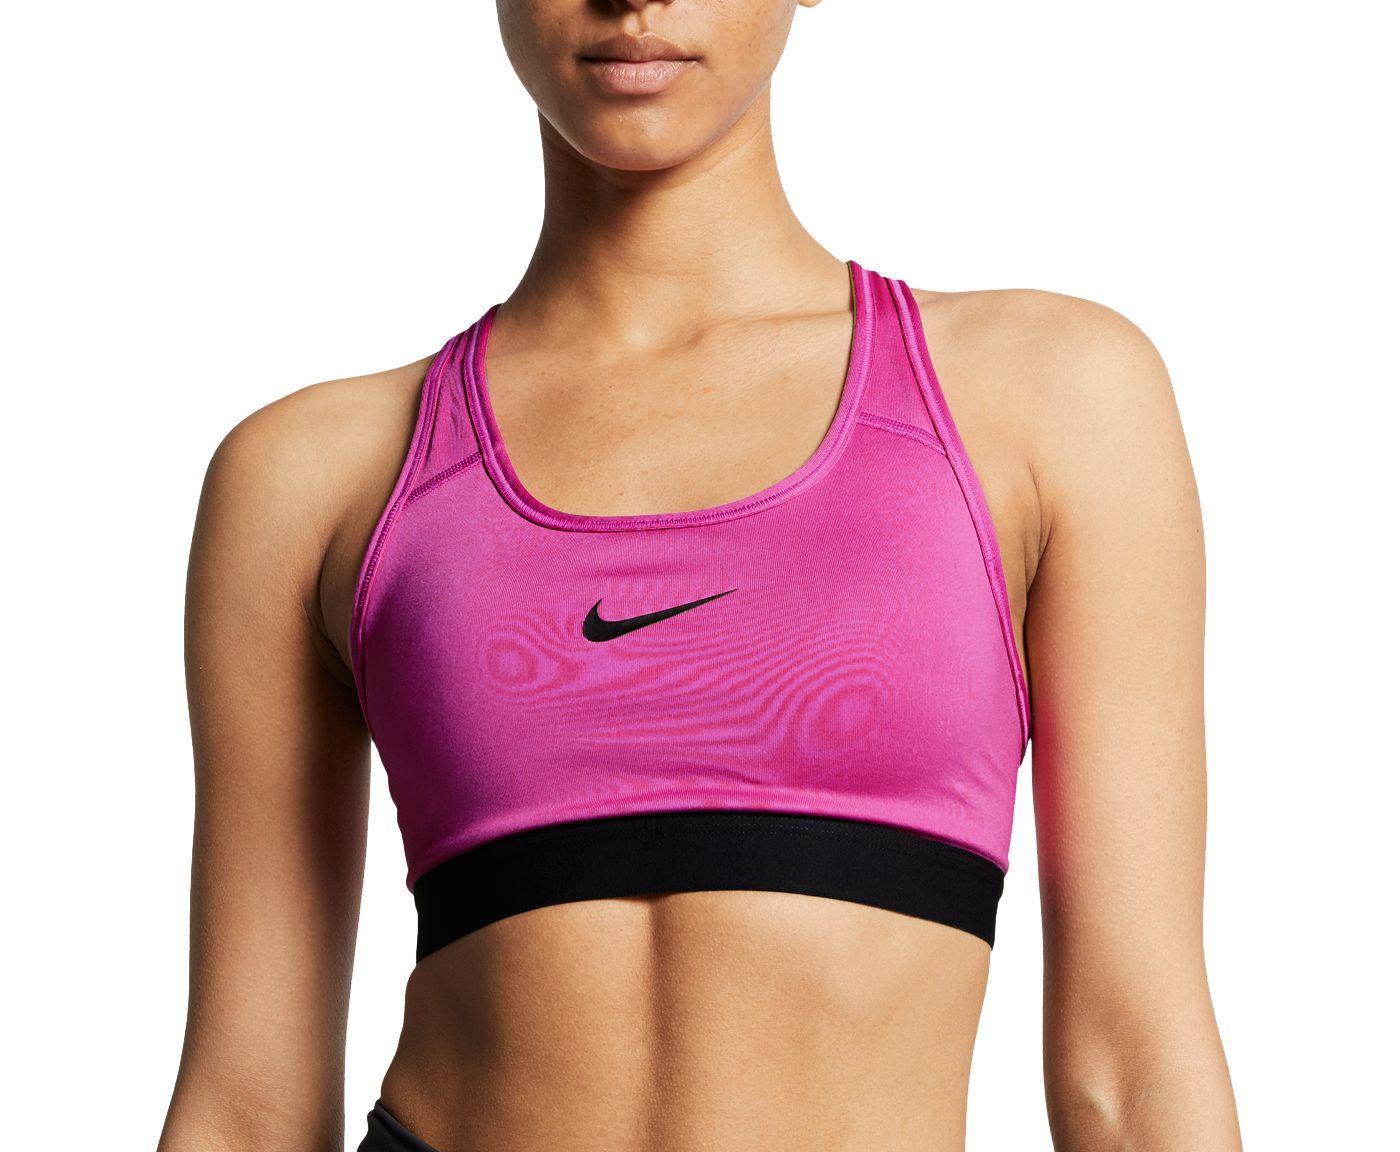 Nike Women's Pro Classic Padded Compression Sports Bra